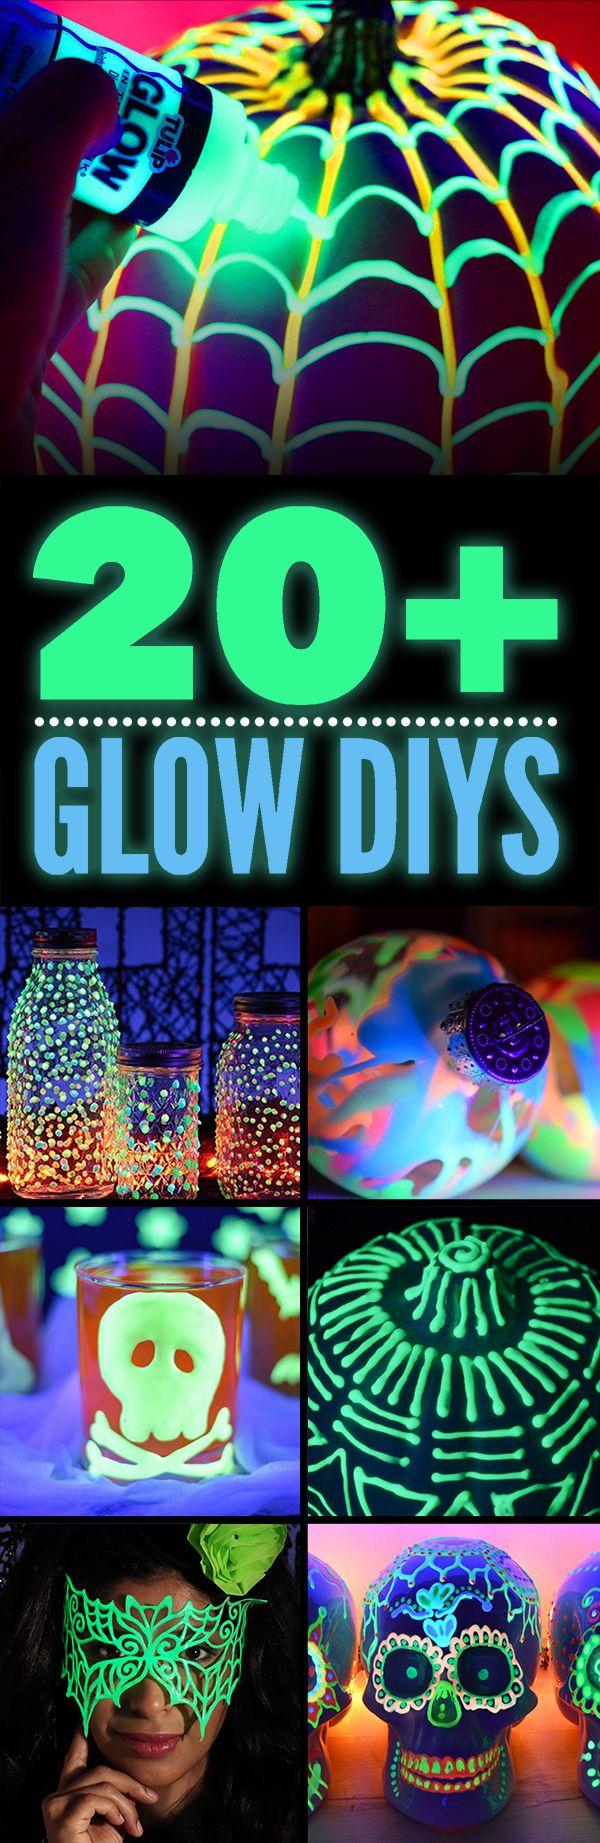 blacklight halloween ideas top 25 best diy blacklight party ideas on pinterest diy neon